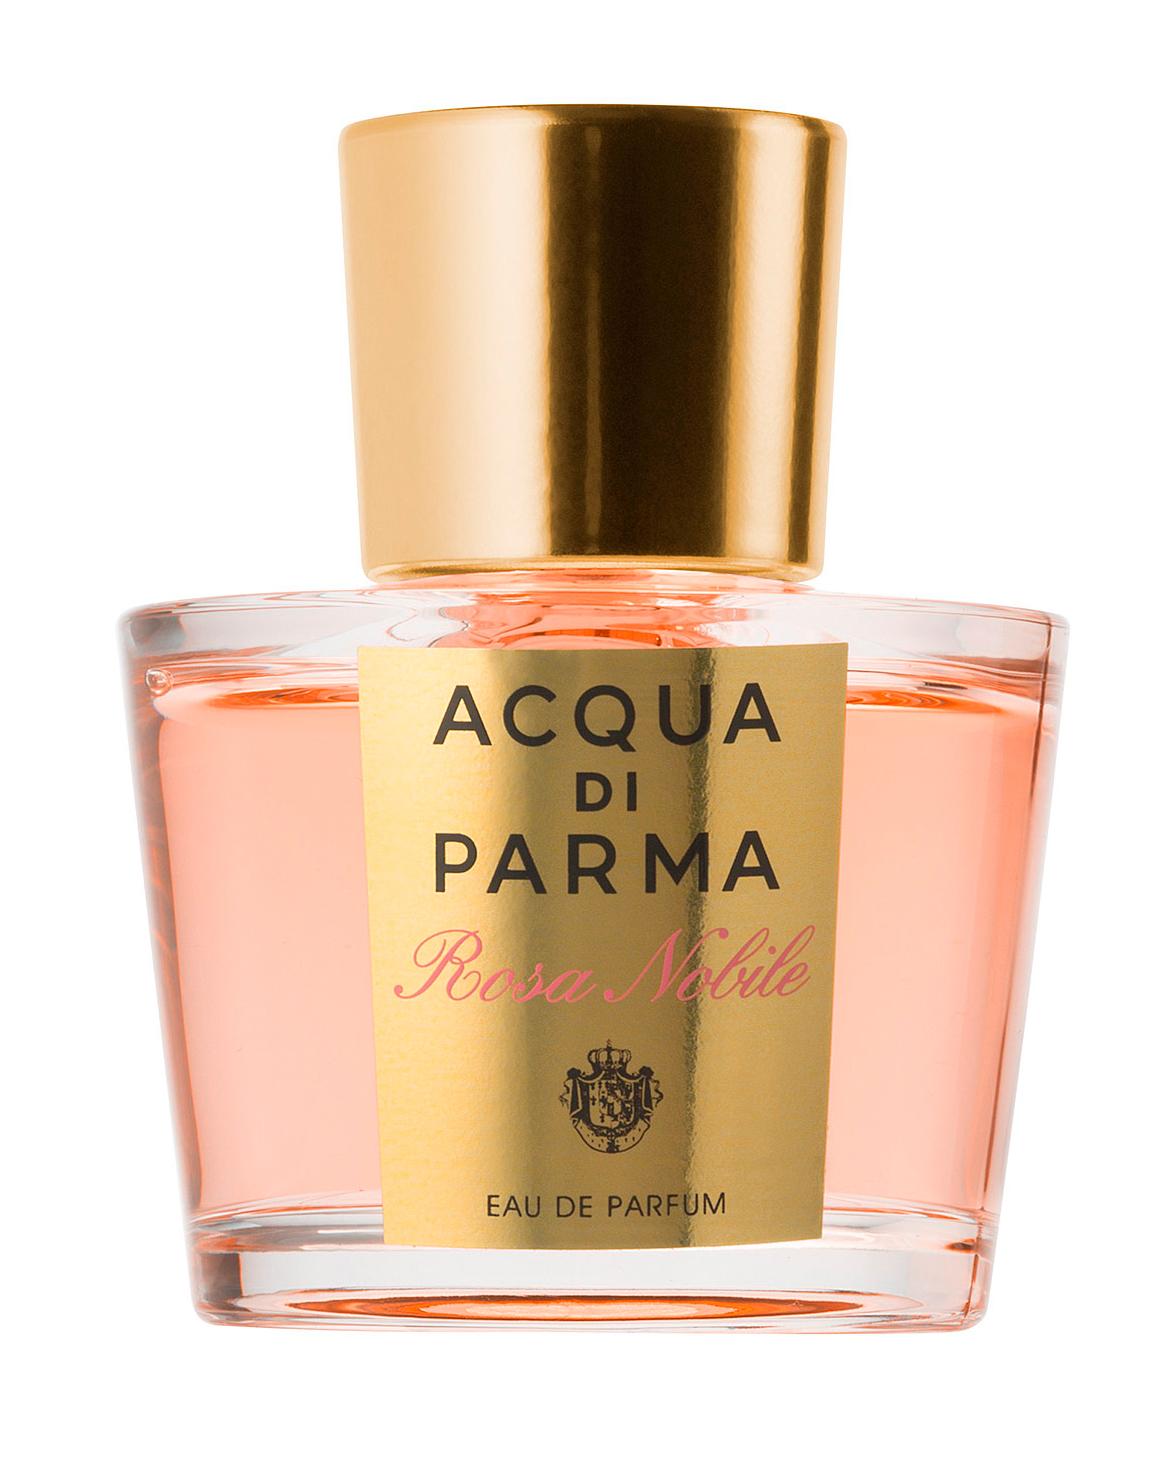 rose-perfume-acqua-di-parma-0315.jpg